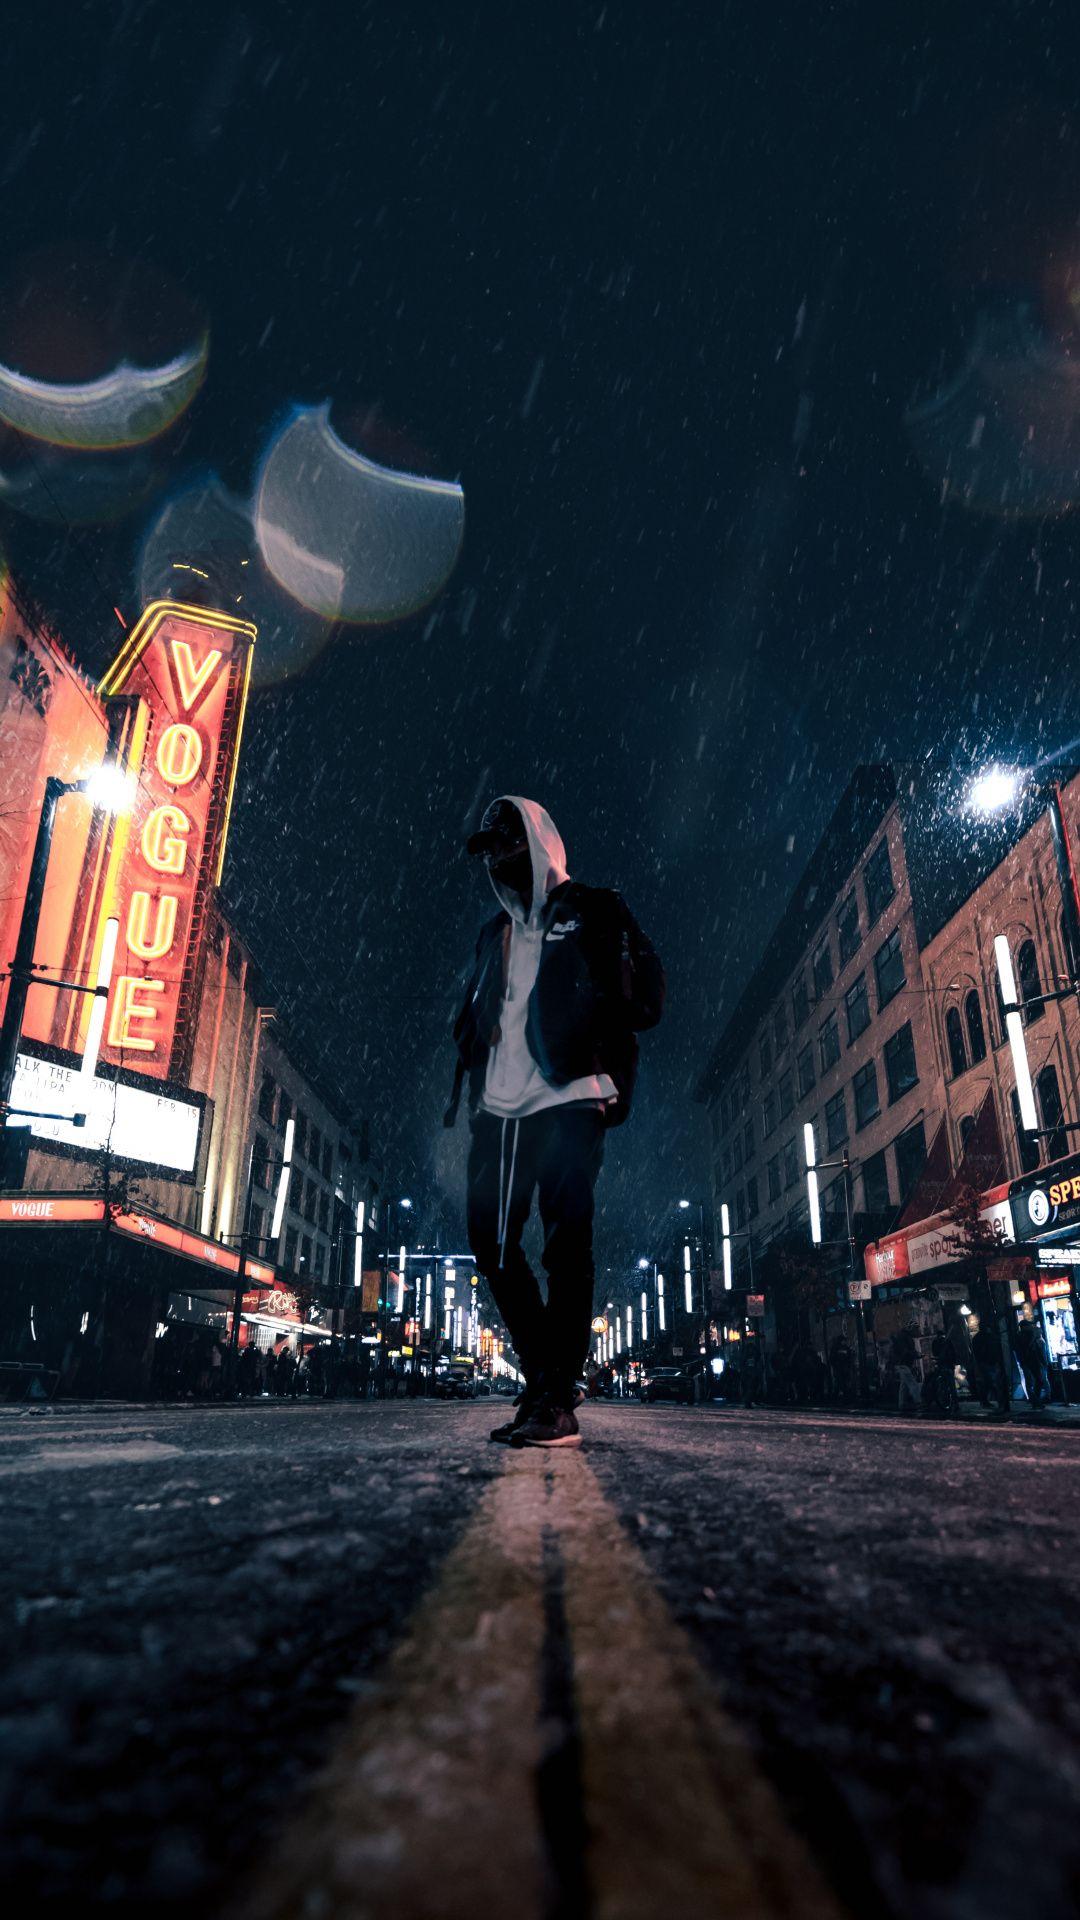 Wallpapers City Building Illustration Music Light Seni Gelap Gambar Simpel Gambar